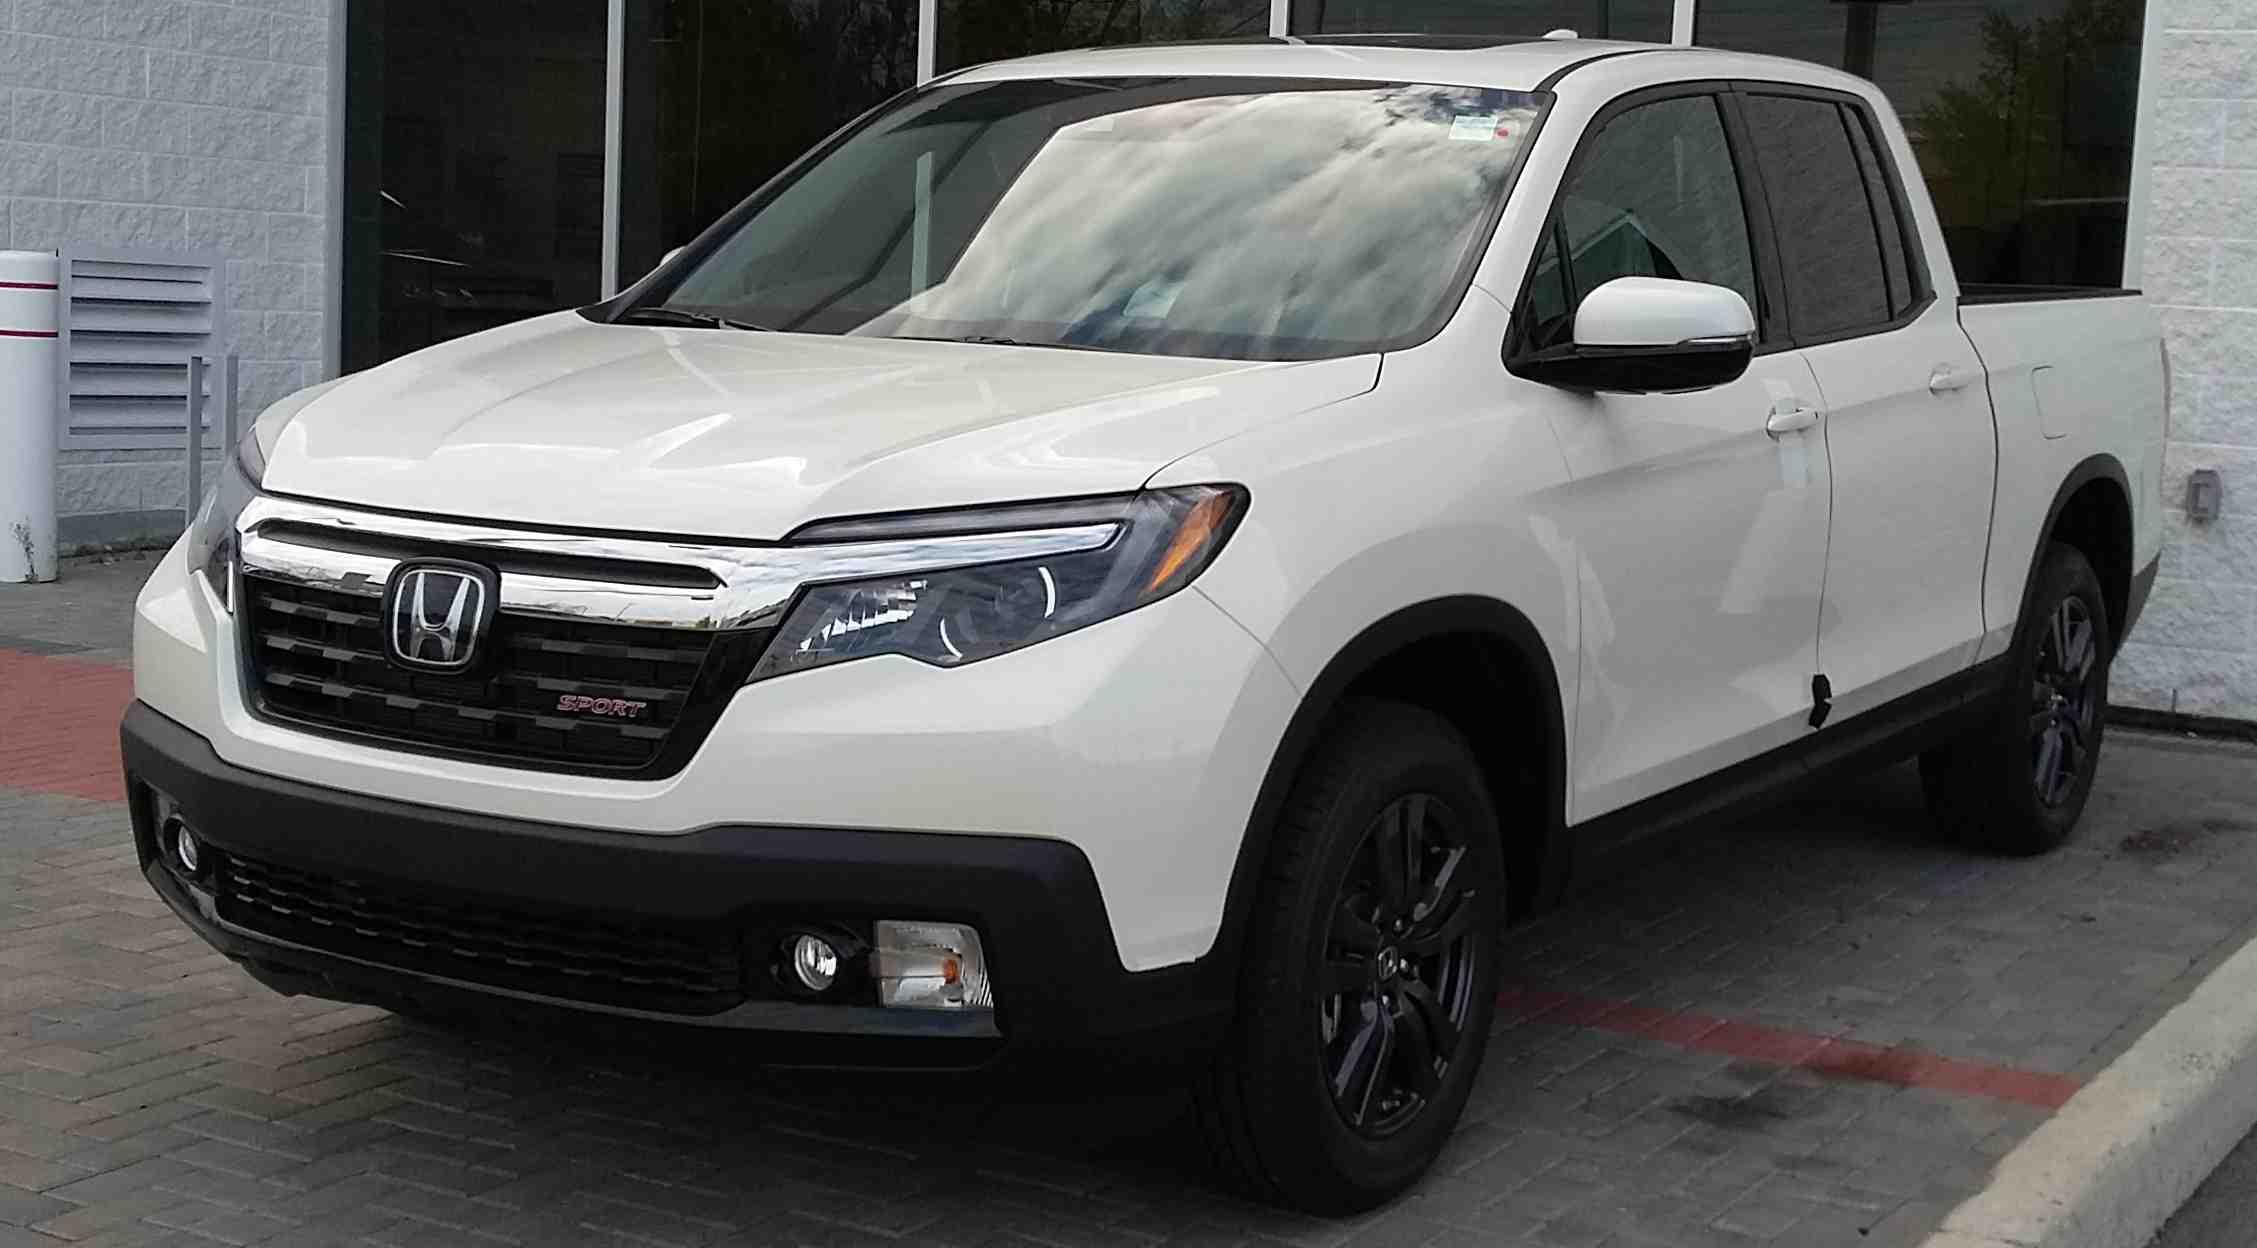 The 2018 Ridgeline has Arrived! - Dow Honda